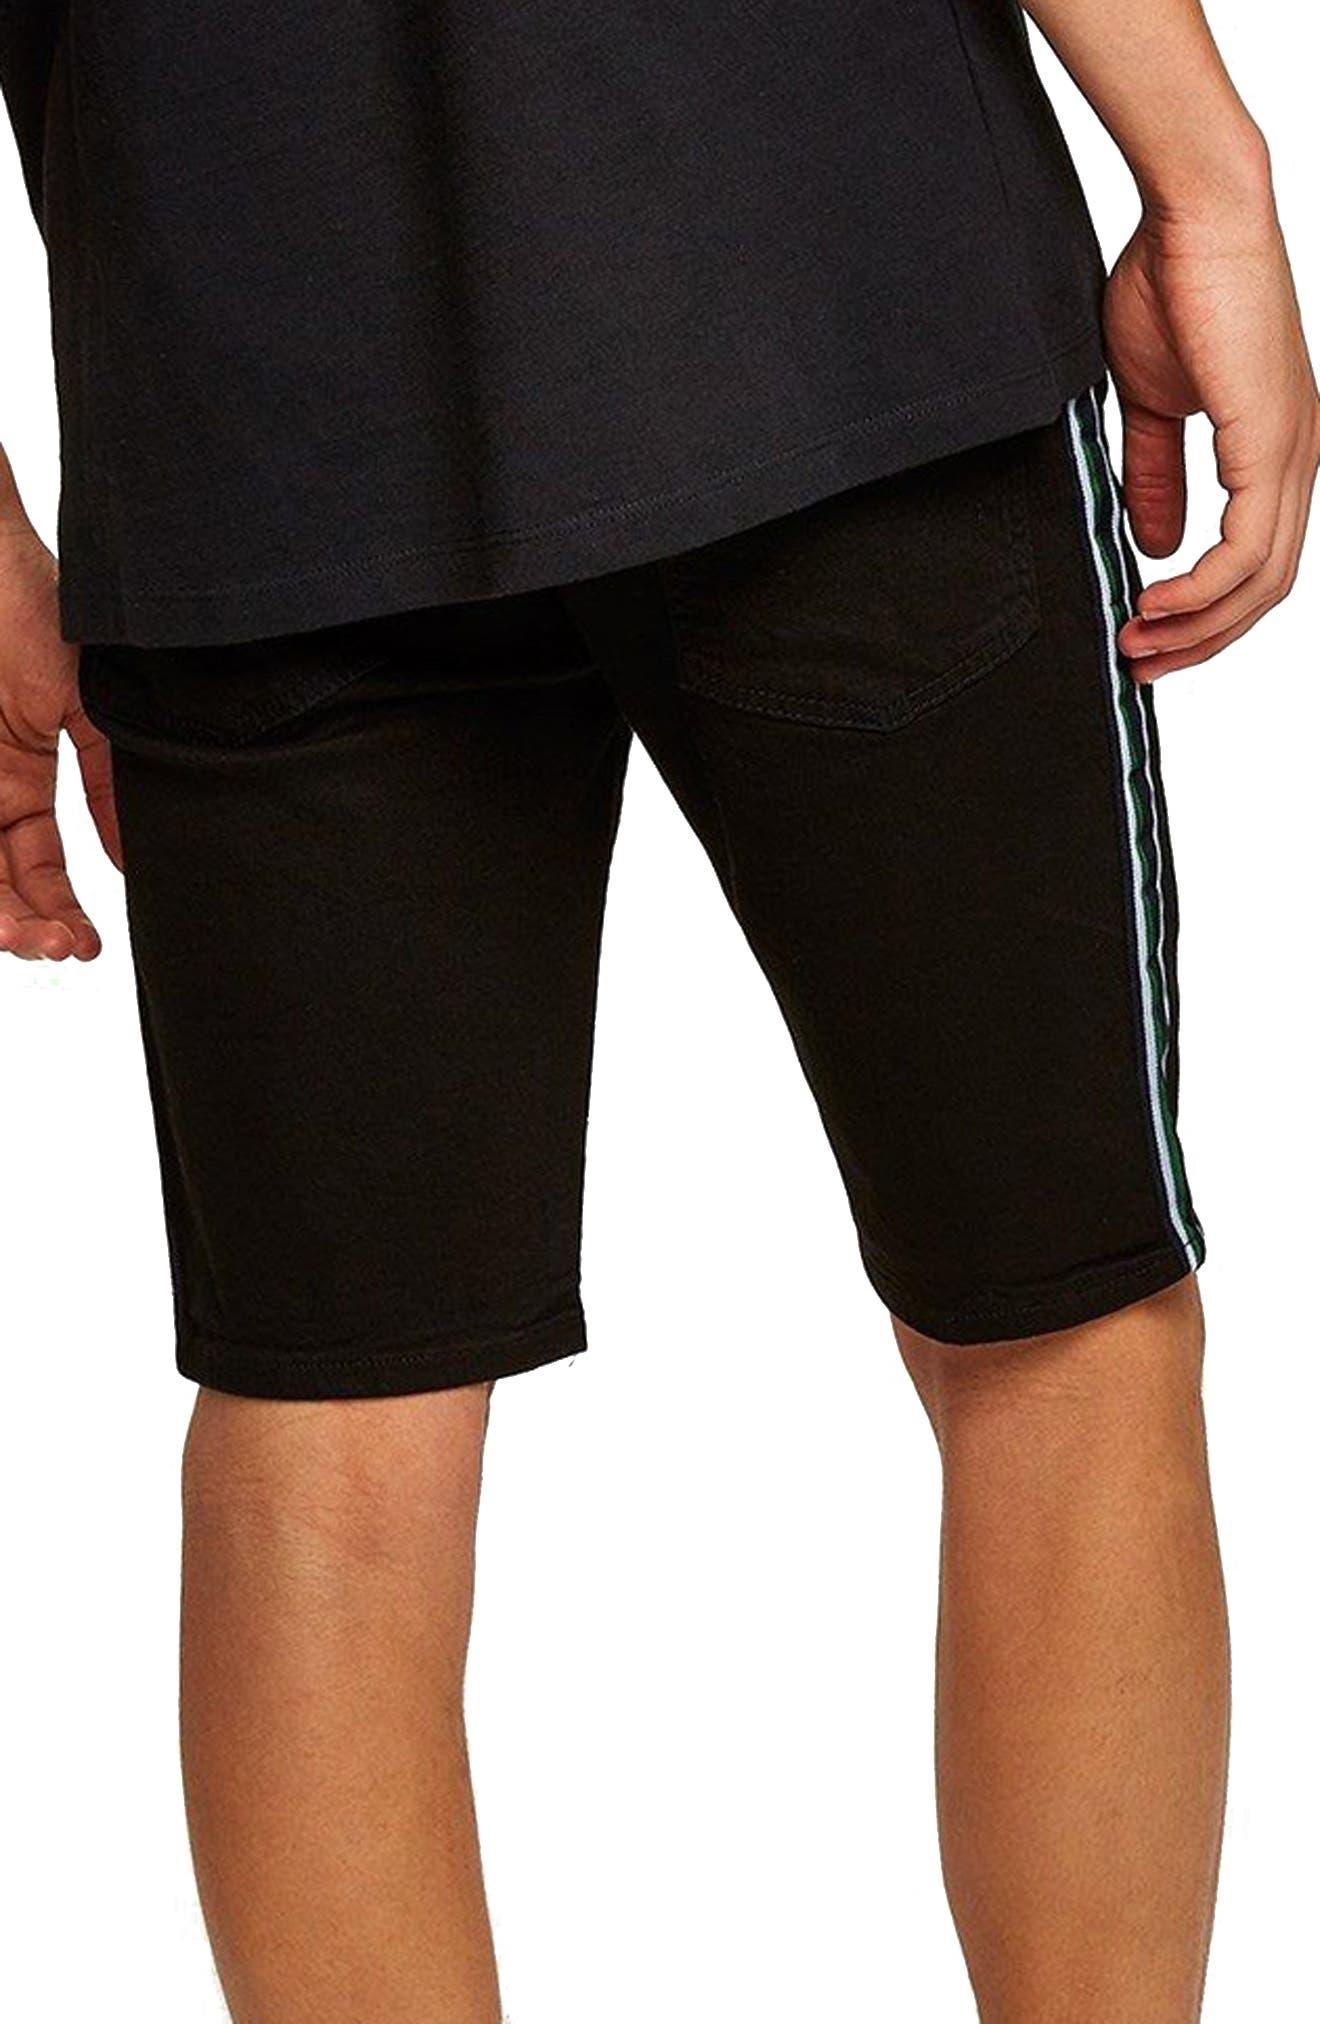 Tape Stretch Skinny Fit Denim Shorts,                             Alternate thumbnail 2, color,                             Black